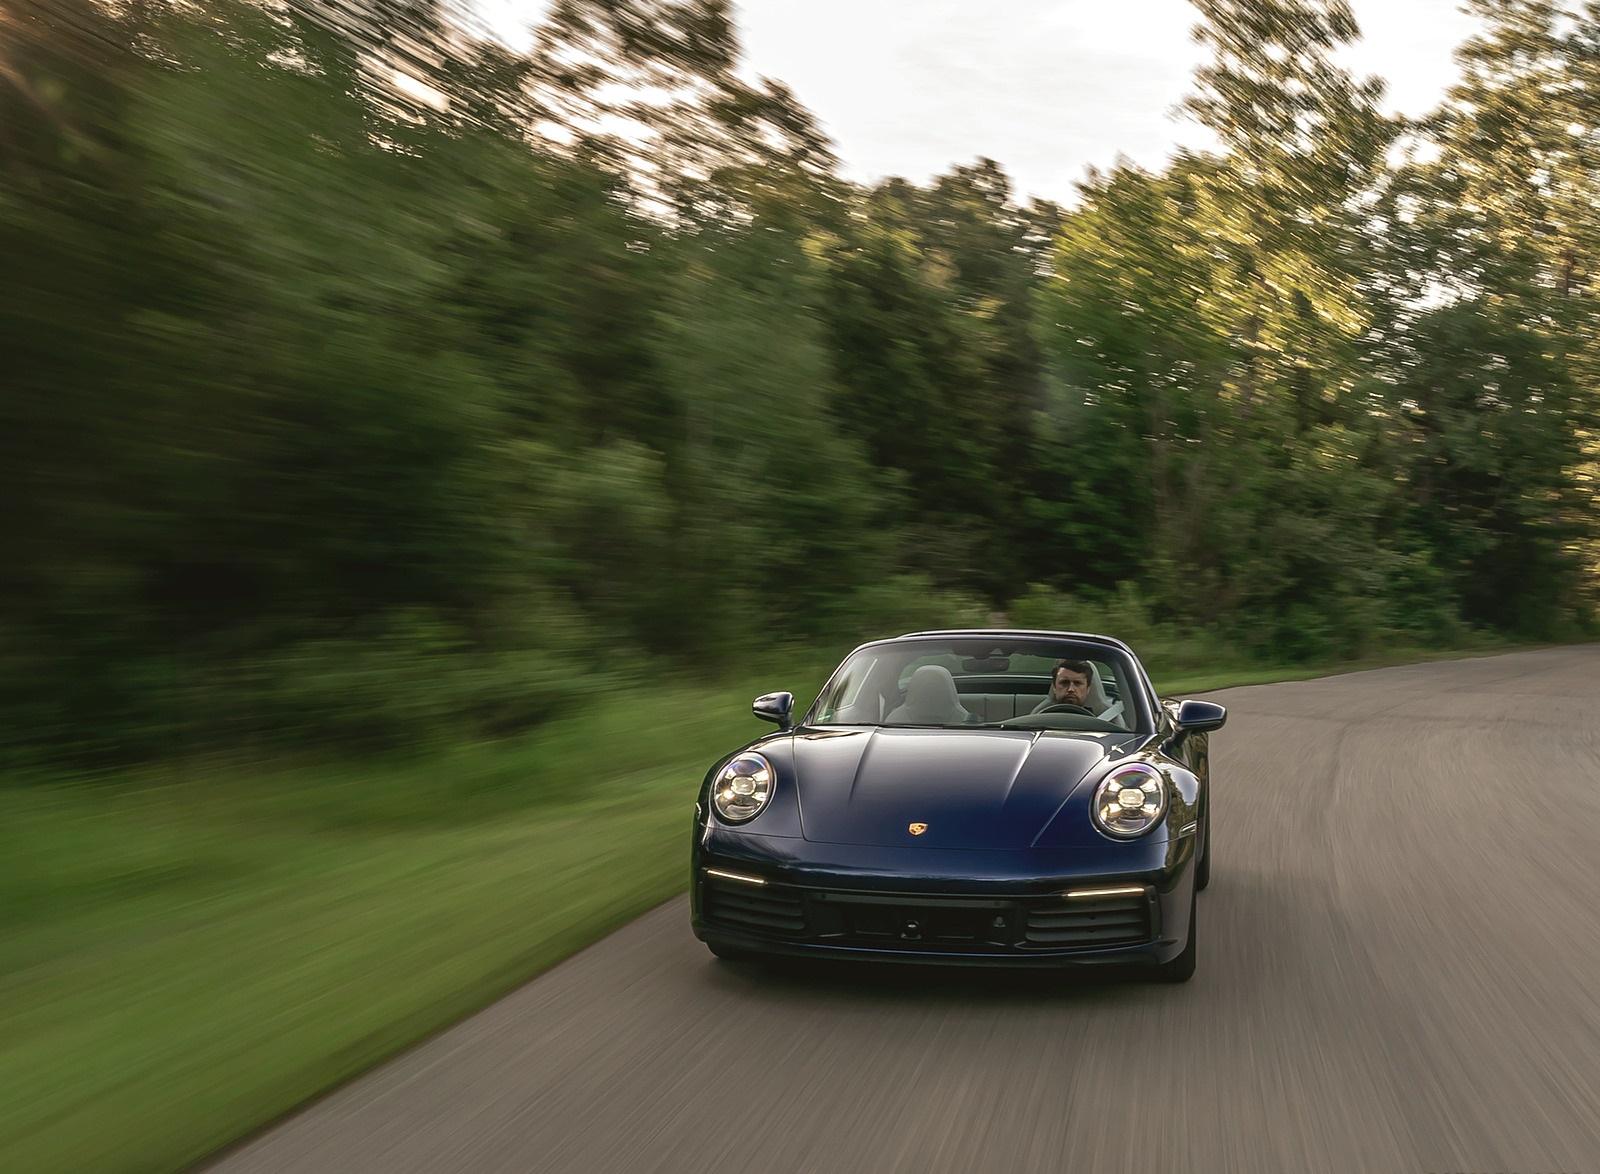 2021 Porsche 911 Targa 4 (Color: Gentian Blue) Front Wallpapers (3)